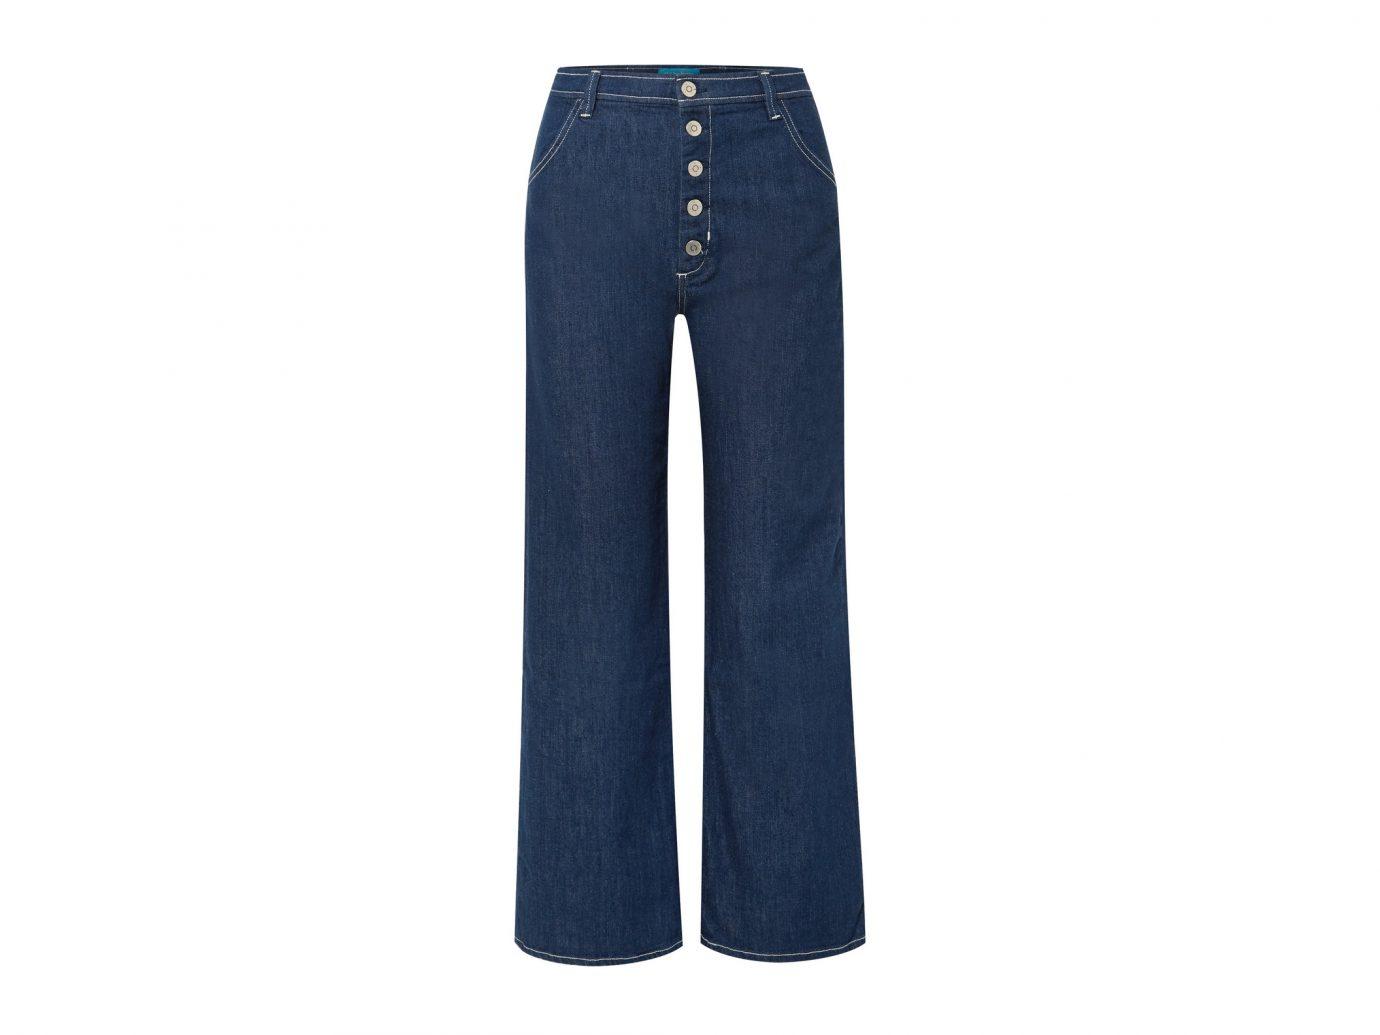 M.I.H JEANS Paradise high-rise wide-leg jeans